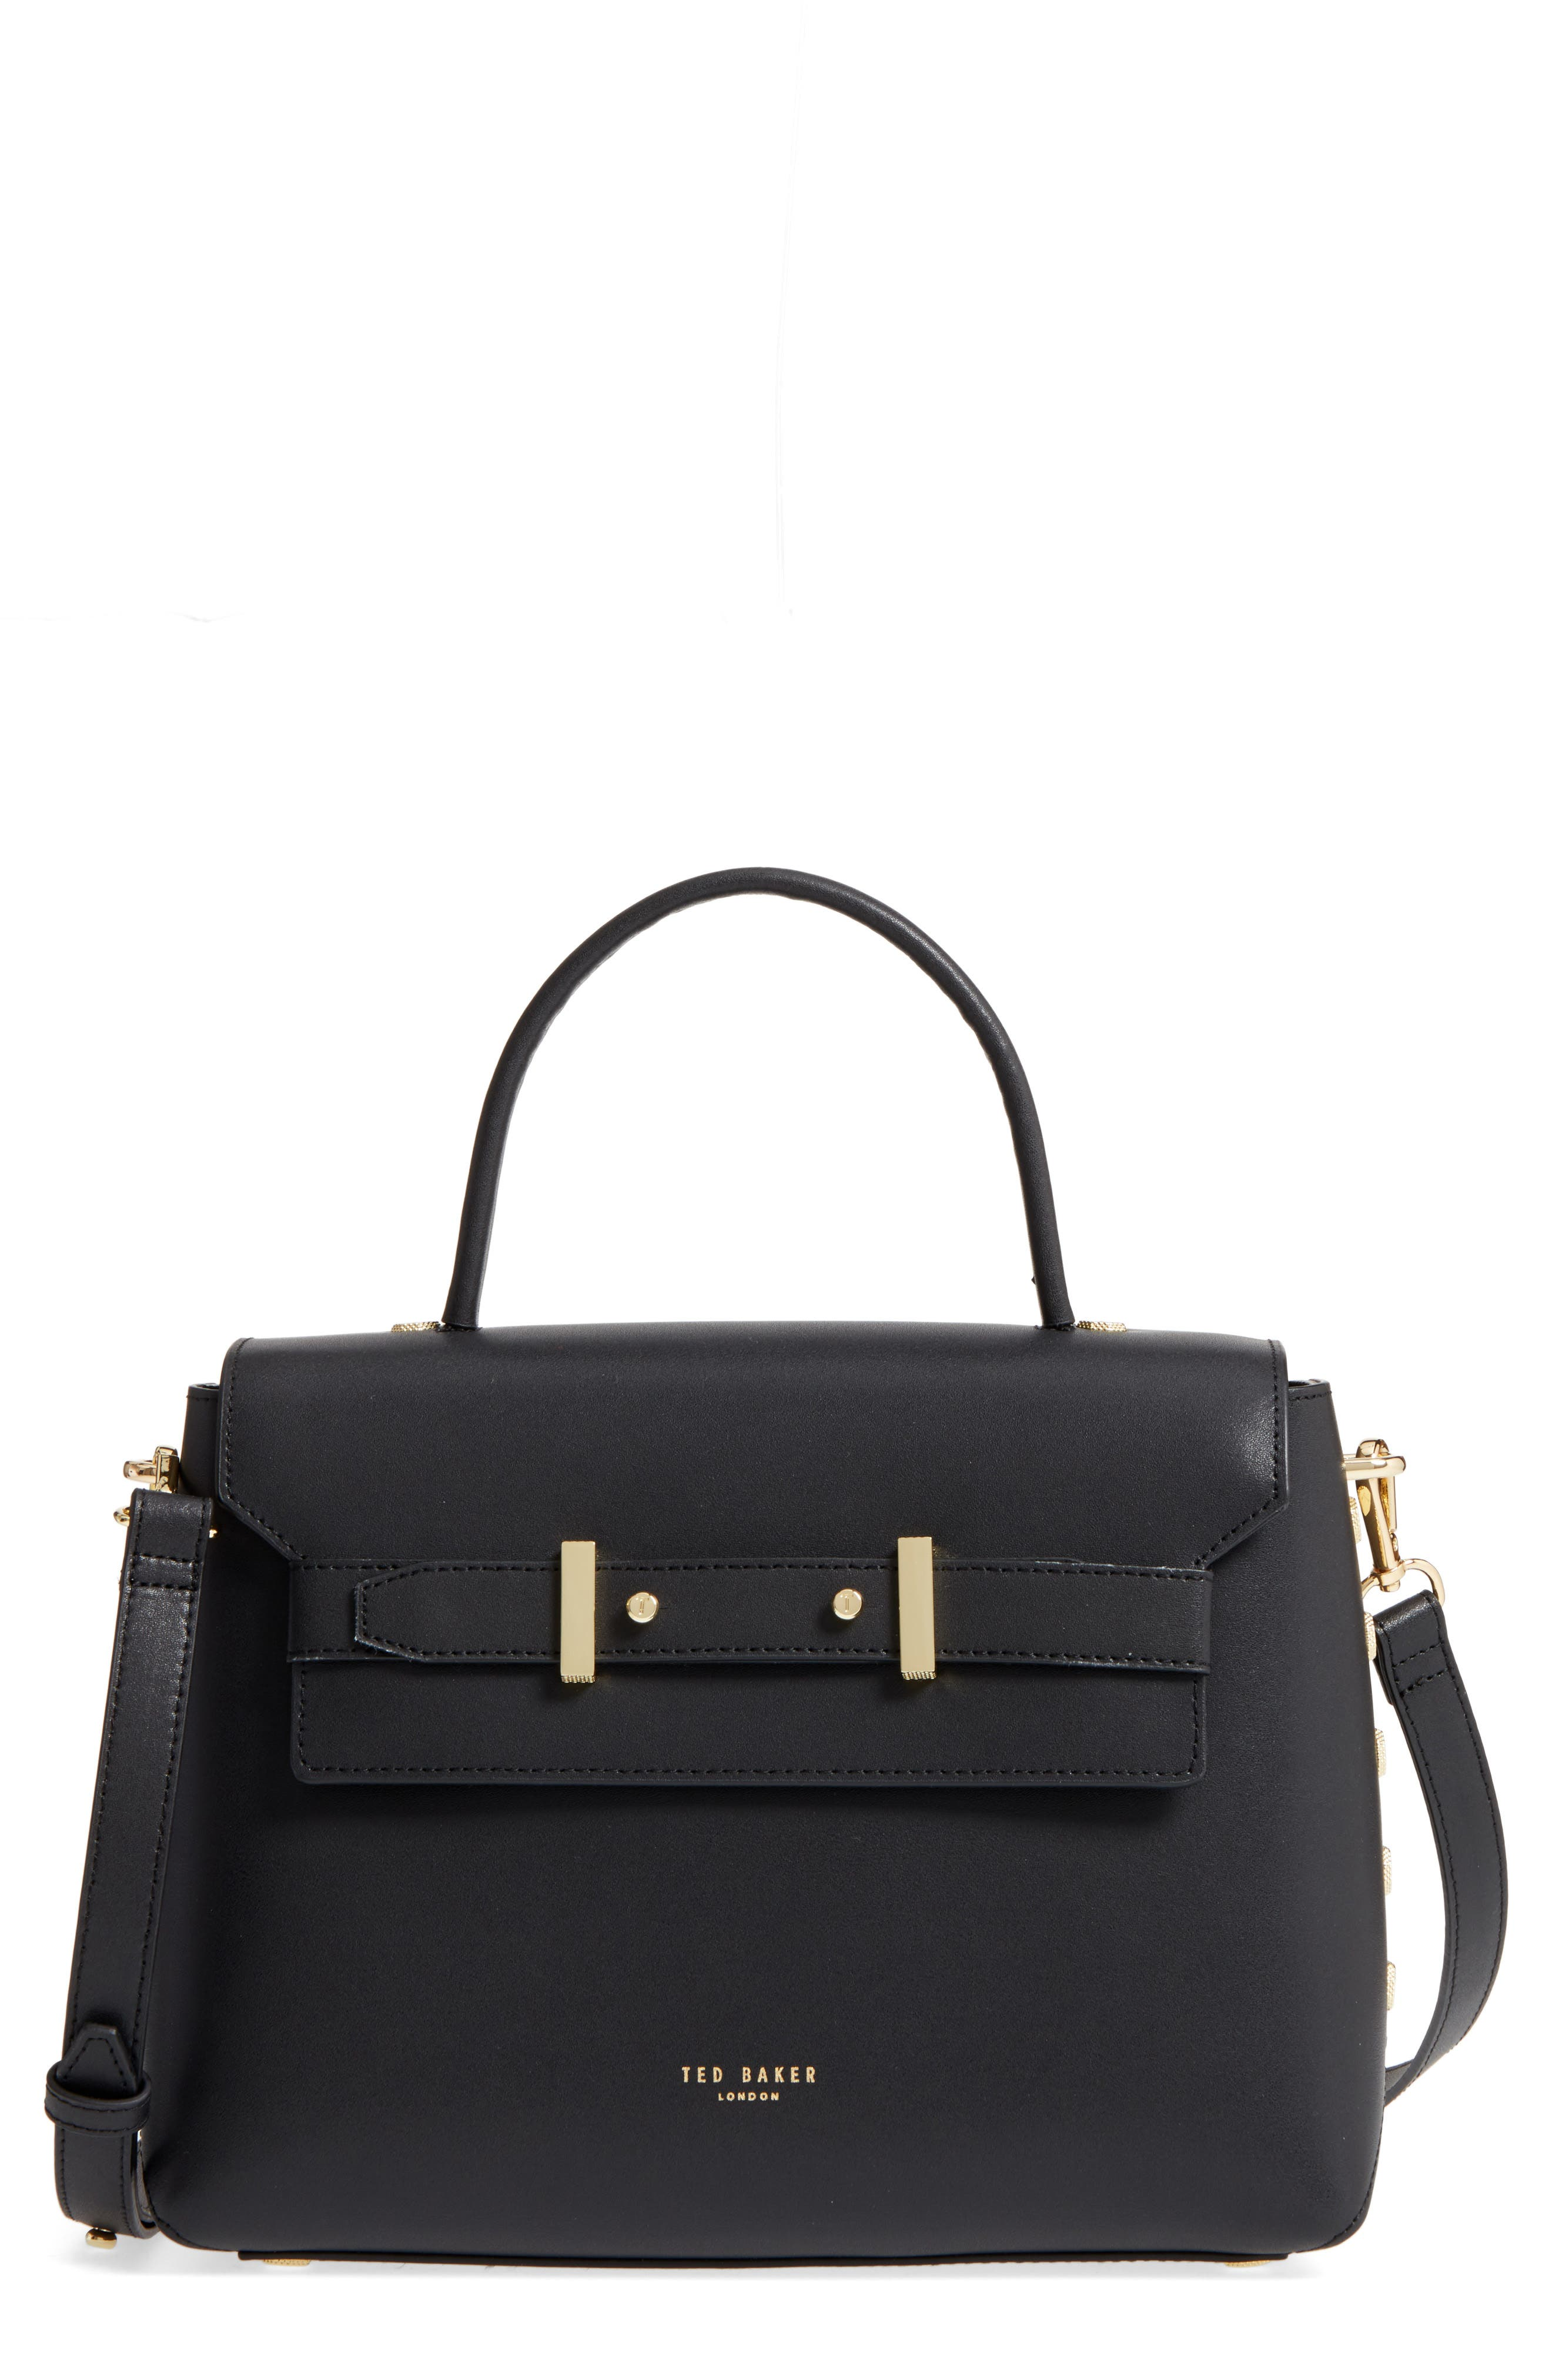 Taymar - Studded Edge Lady Bag Leather Top Handle Satchel,                             Main thumbnail 1, color,                             001